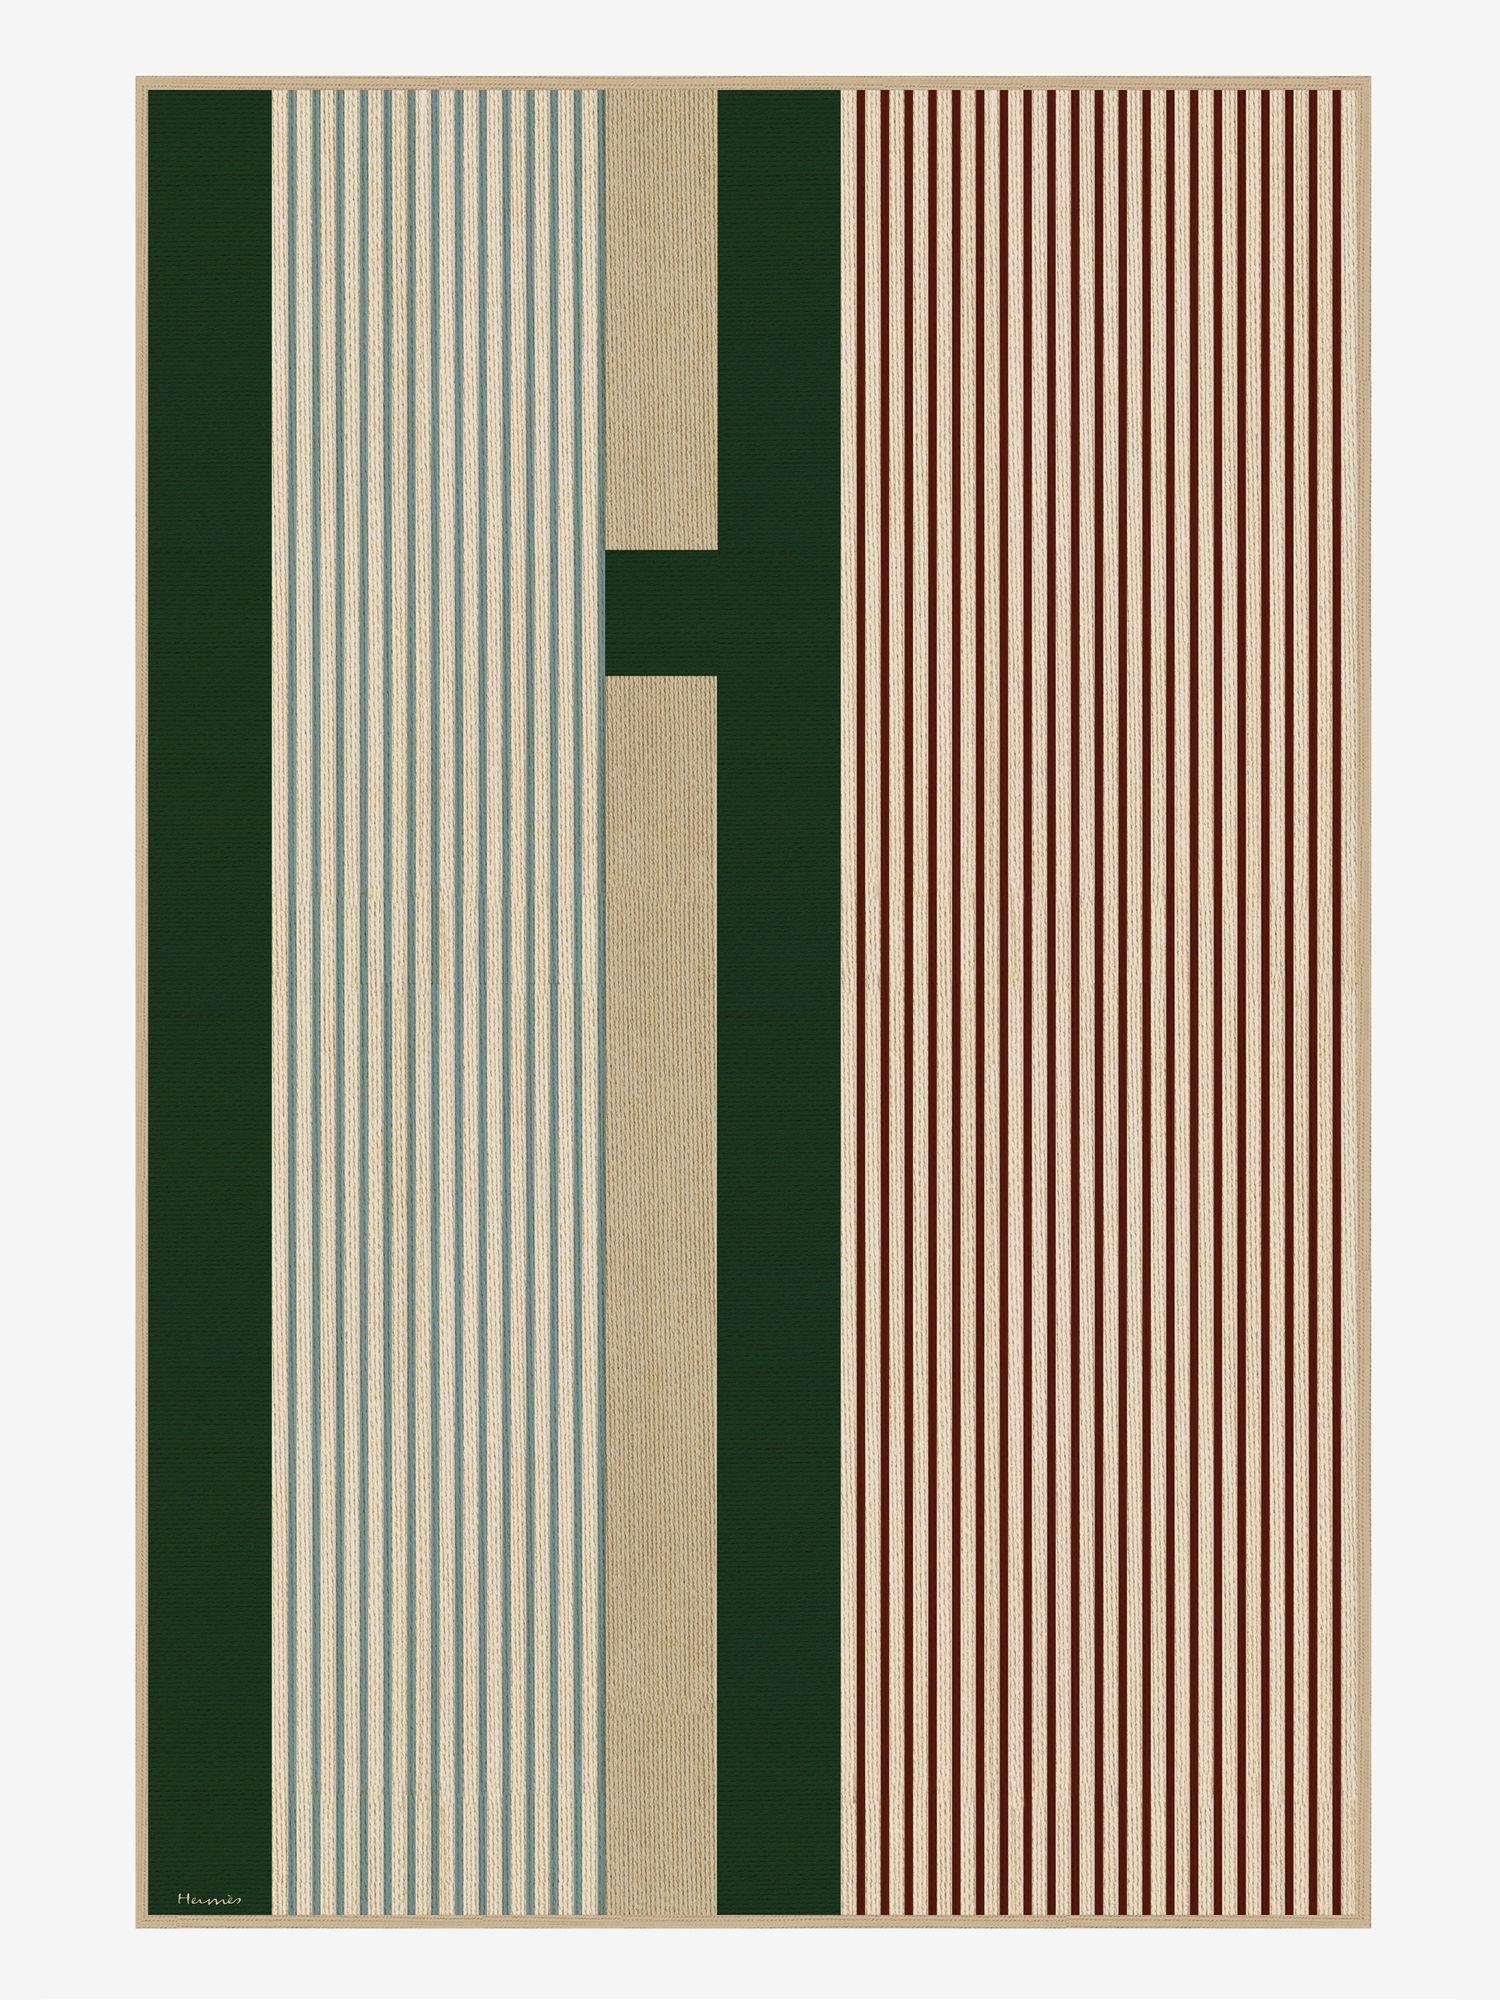 H Vibration rug, from Hermès